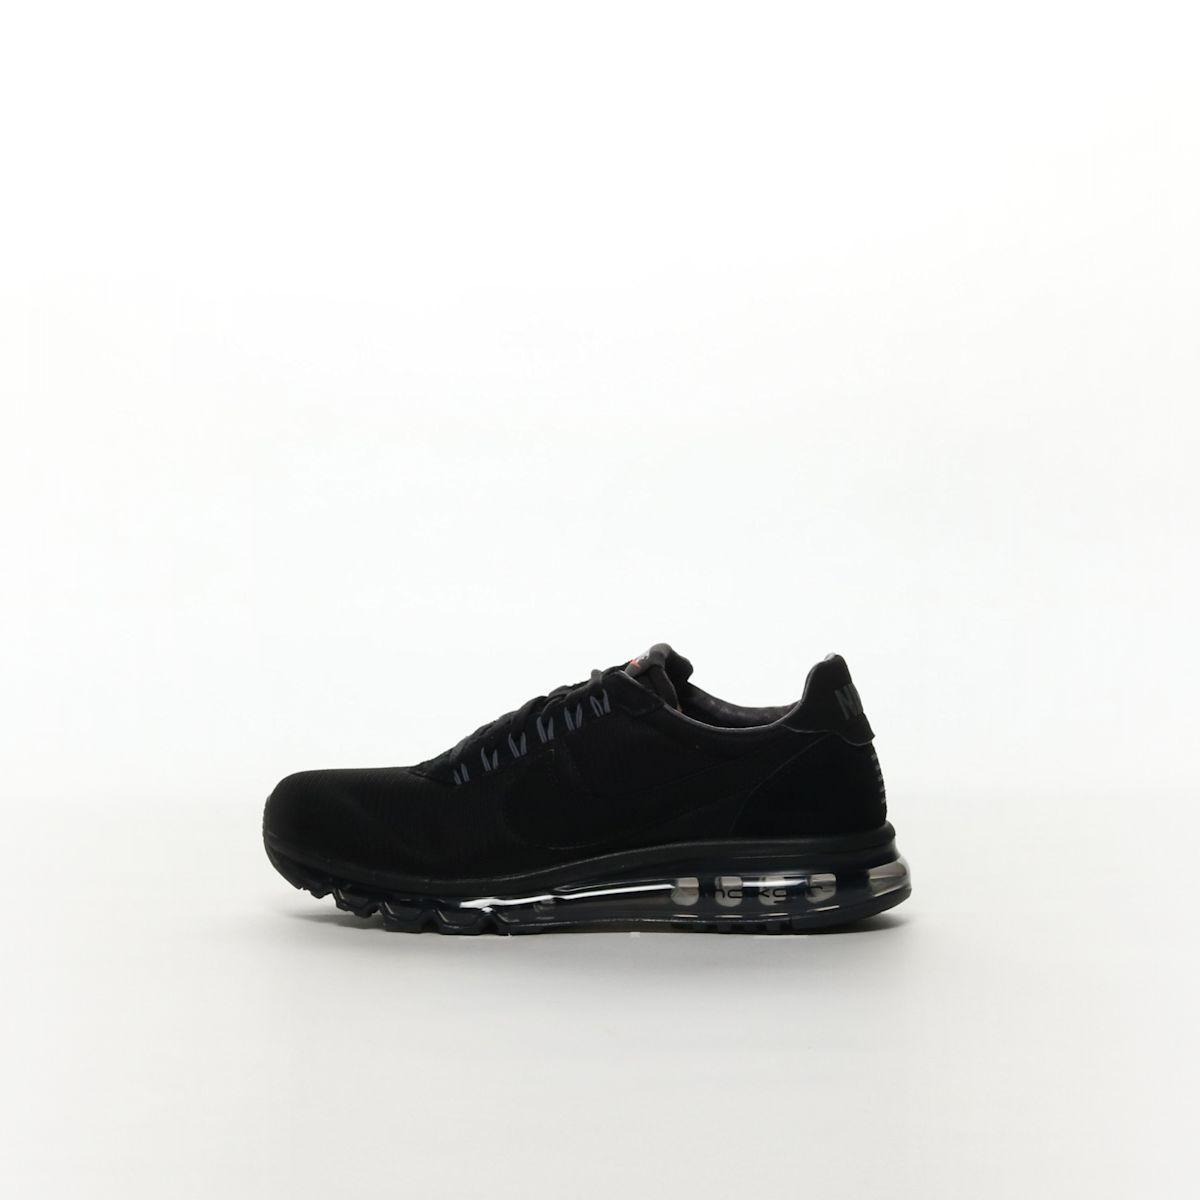 Nike Air Max Zero Mens – Air Max LD Zero BlackBlack Dark